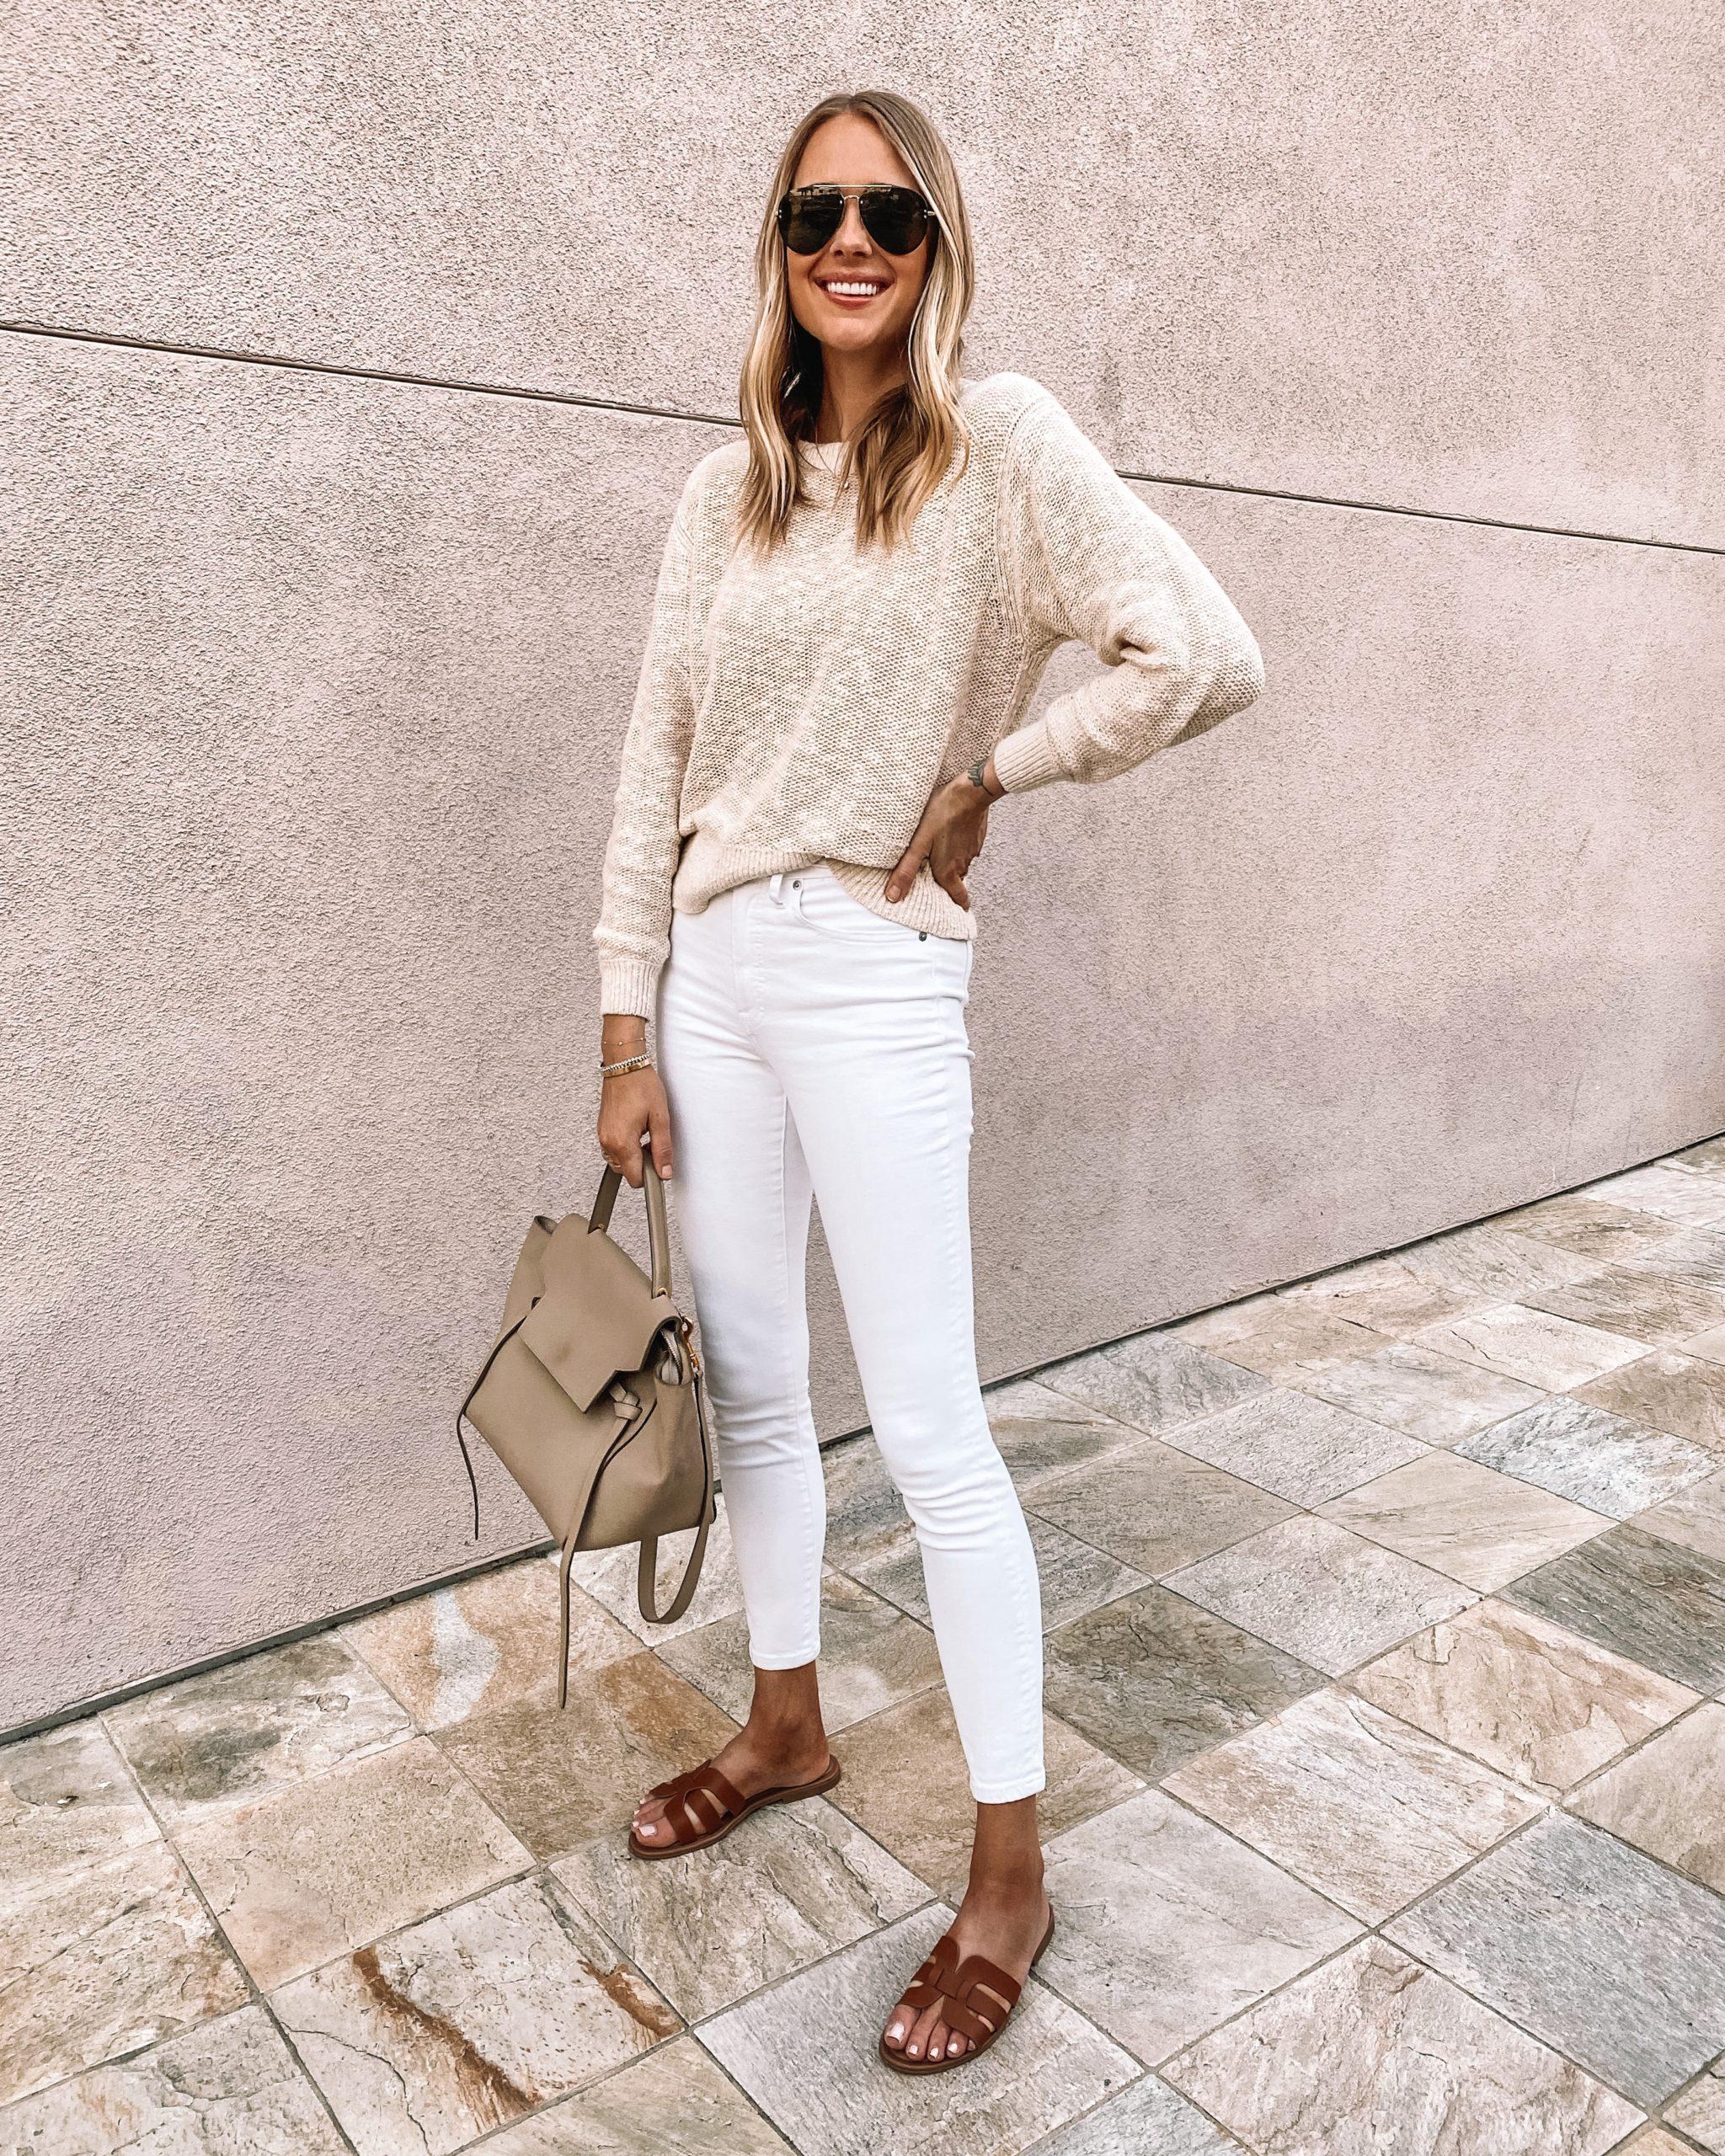 Fashion Jackson Wearing Everlane Beige Sweater Everlane White Skinny Jeans